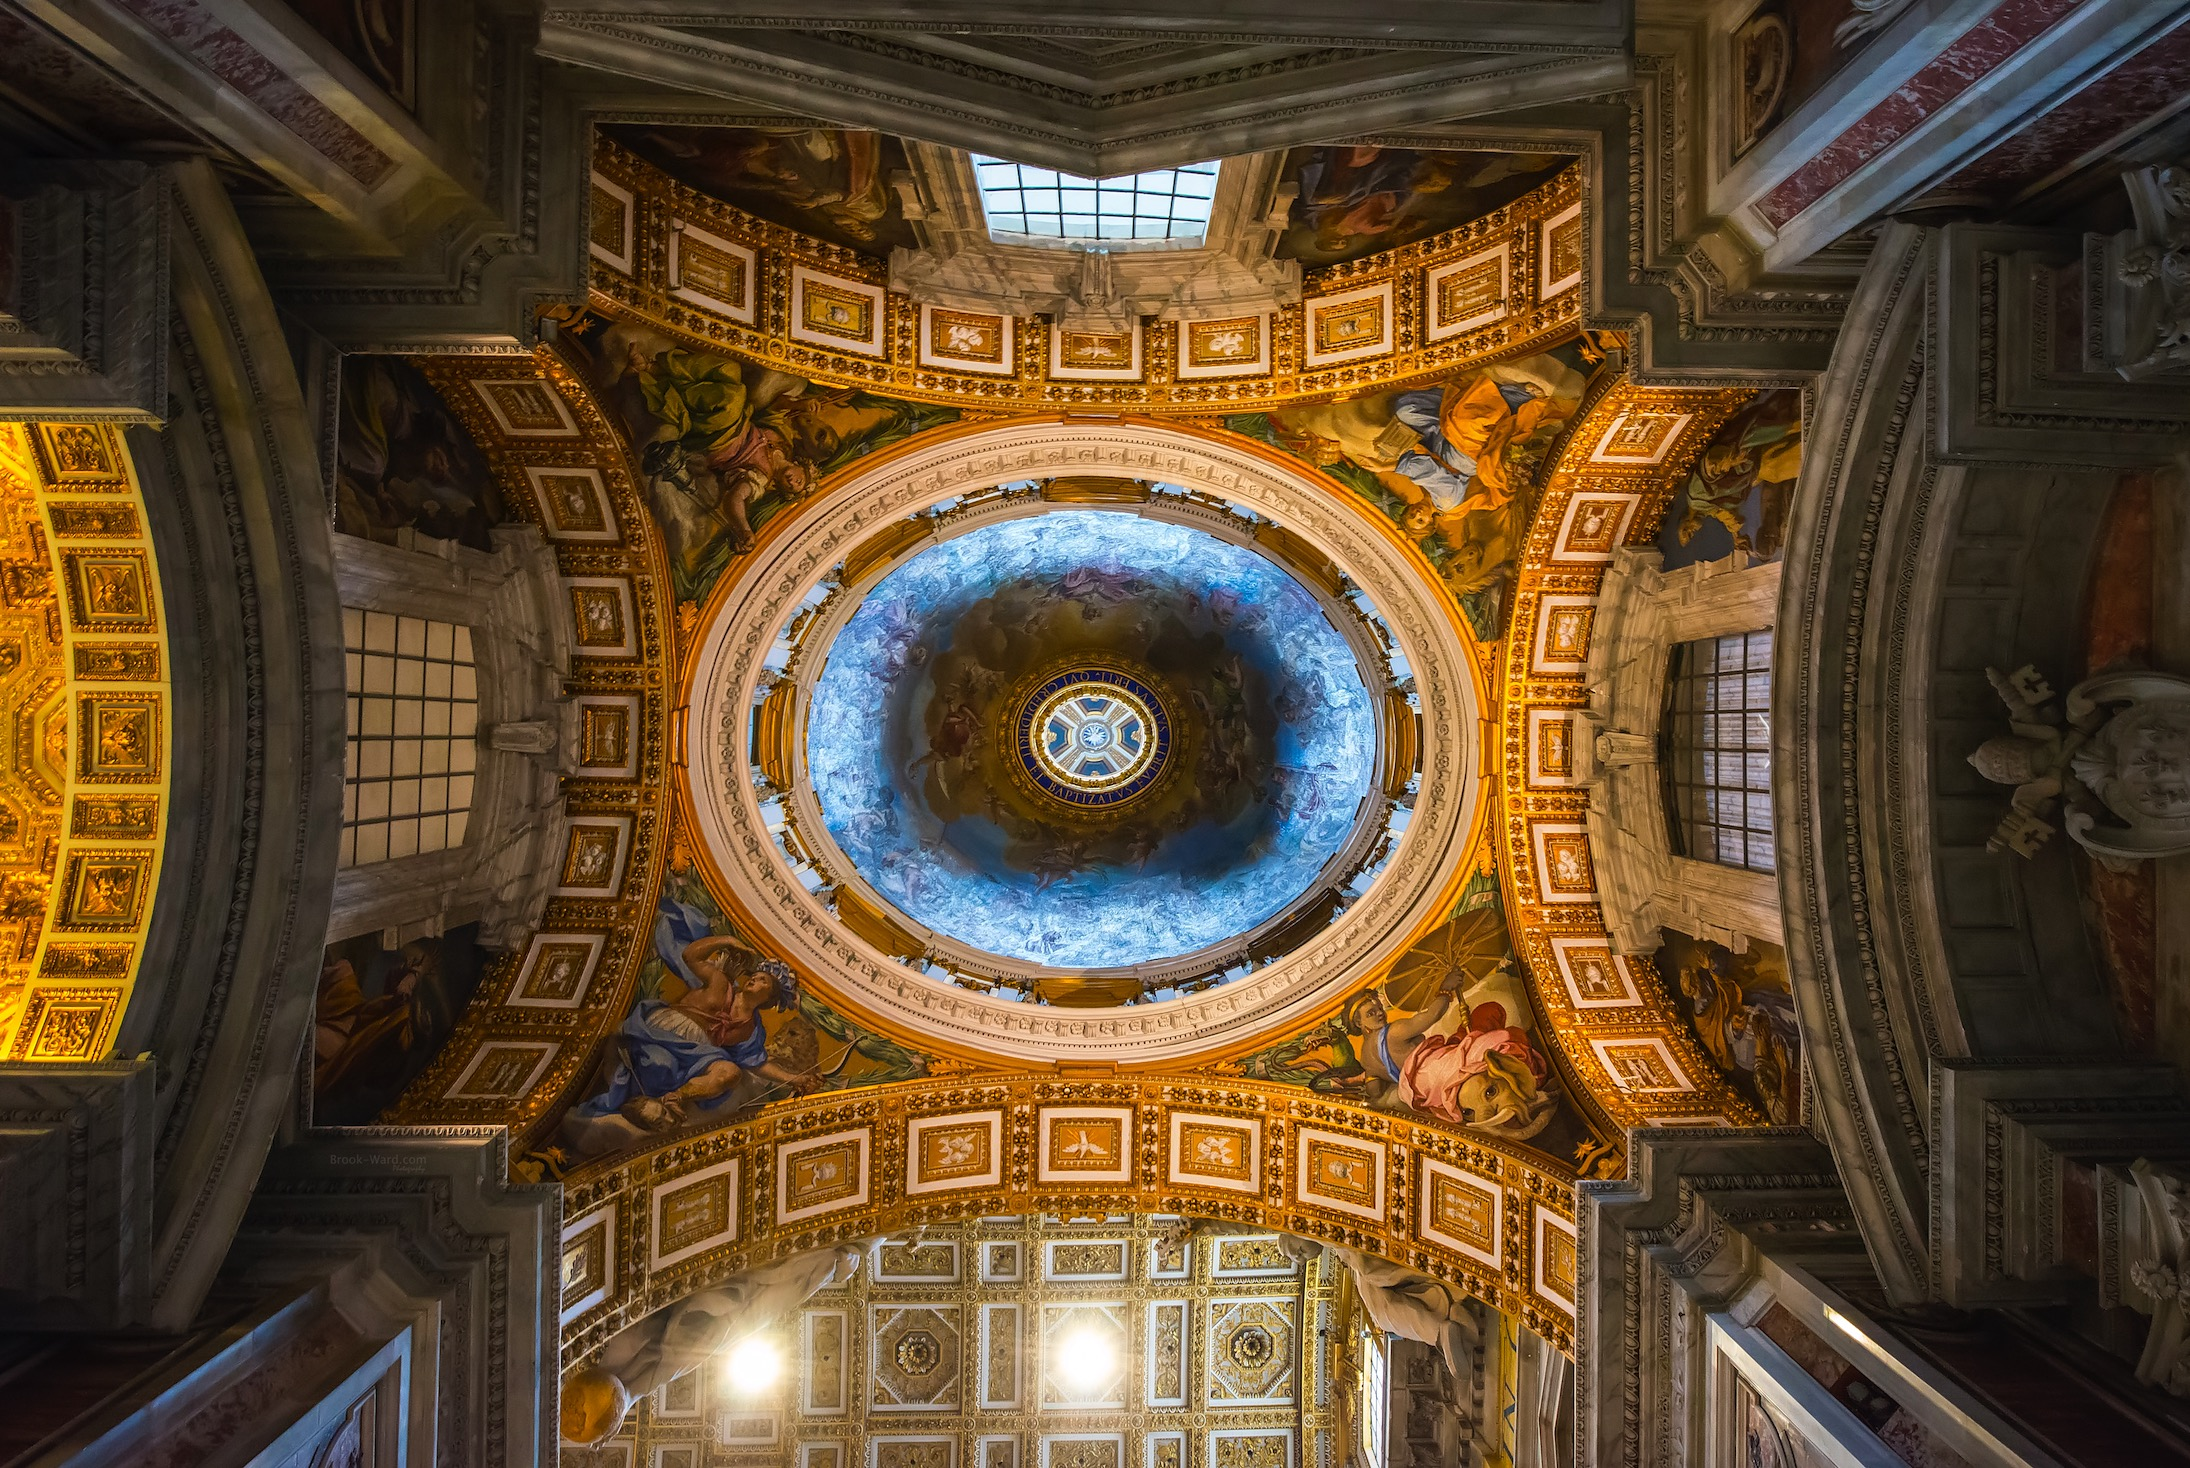 Ceiling inside St. Peter's Basilica